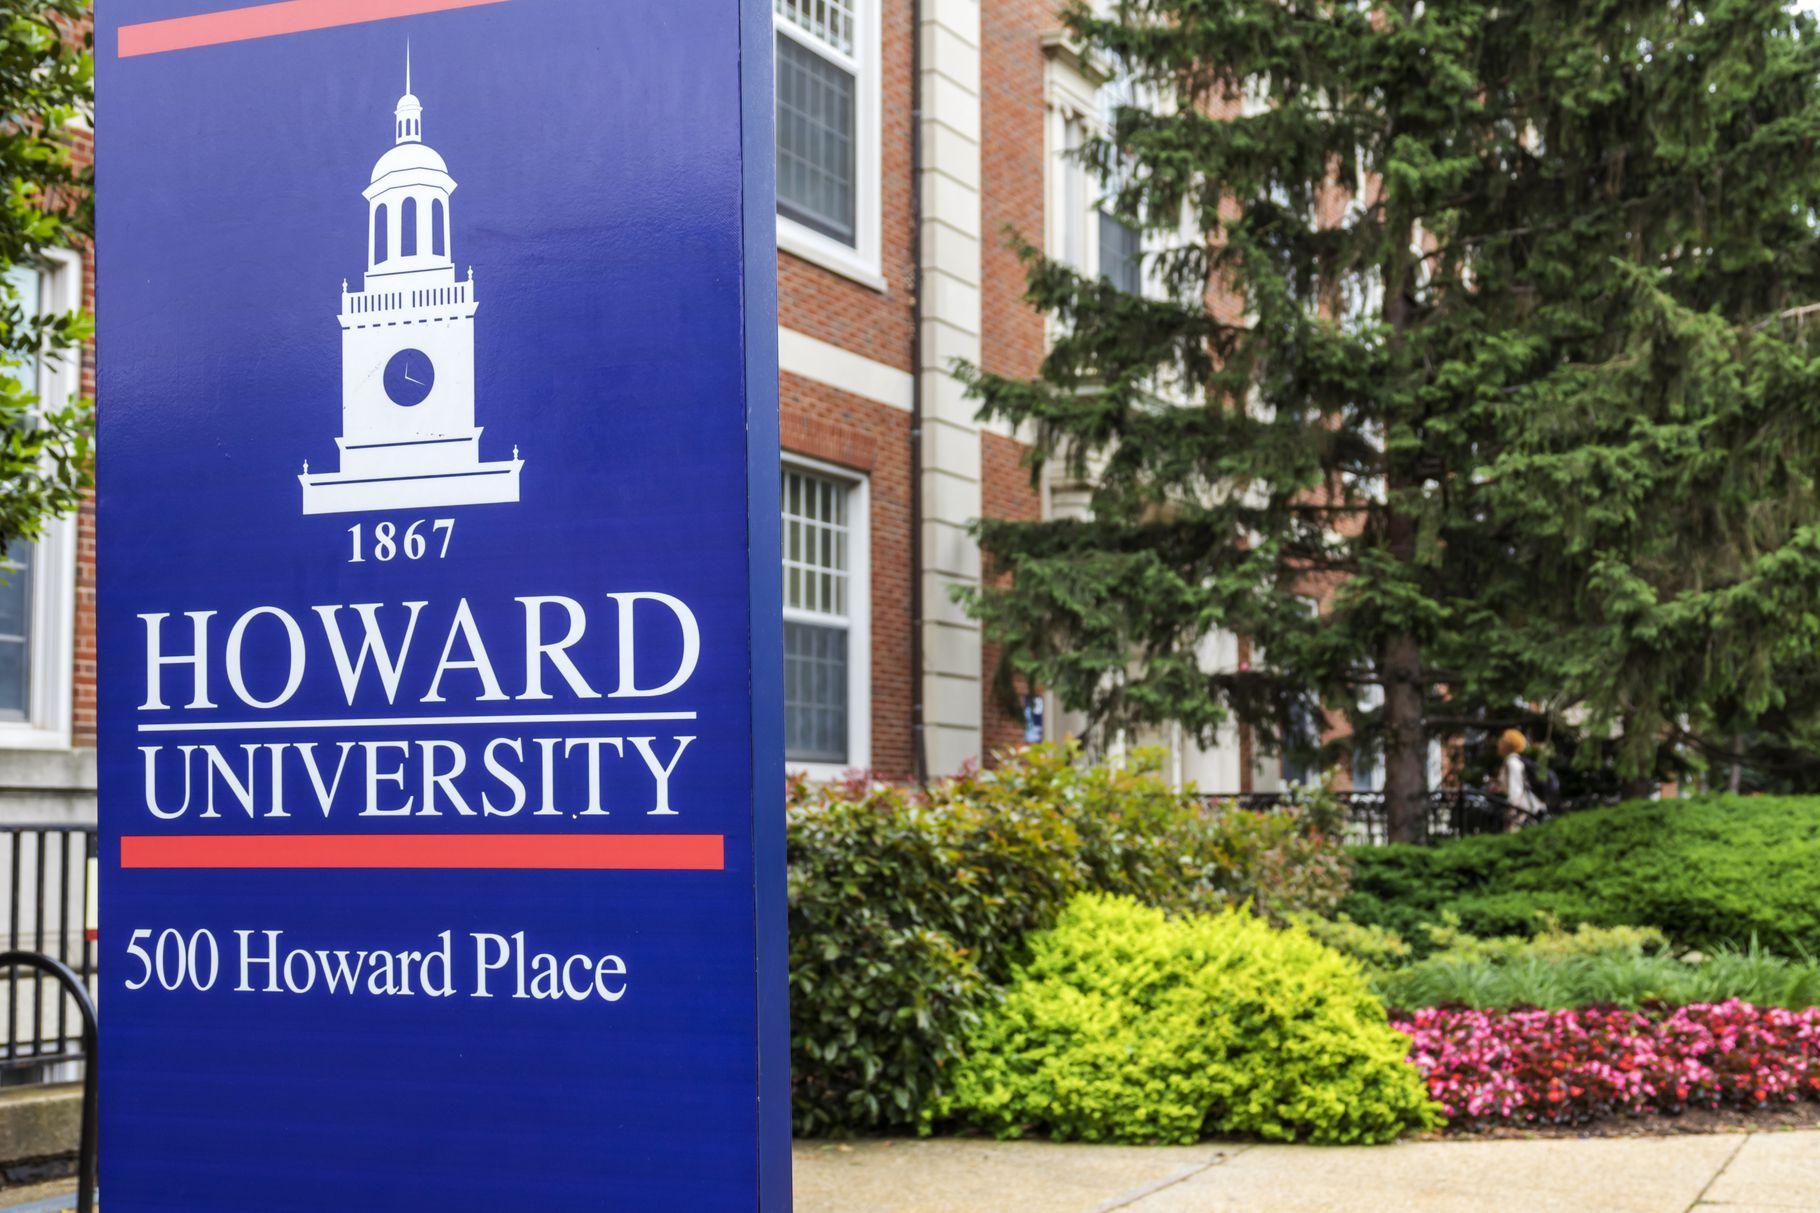 Howard U Awarded $1M Gift For Coates-Forbes-Watson-HBO Dream Seekers Endowed Fellowship